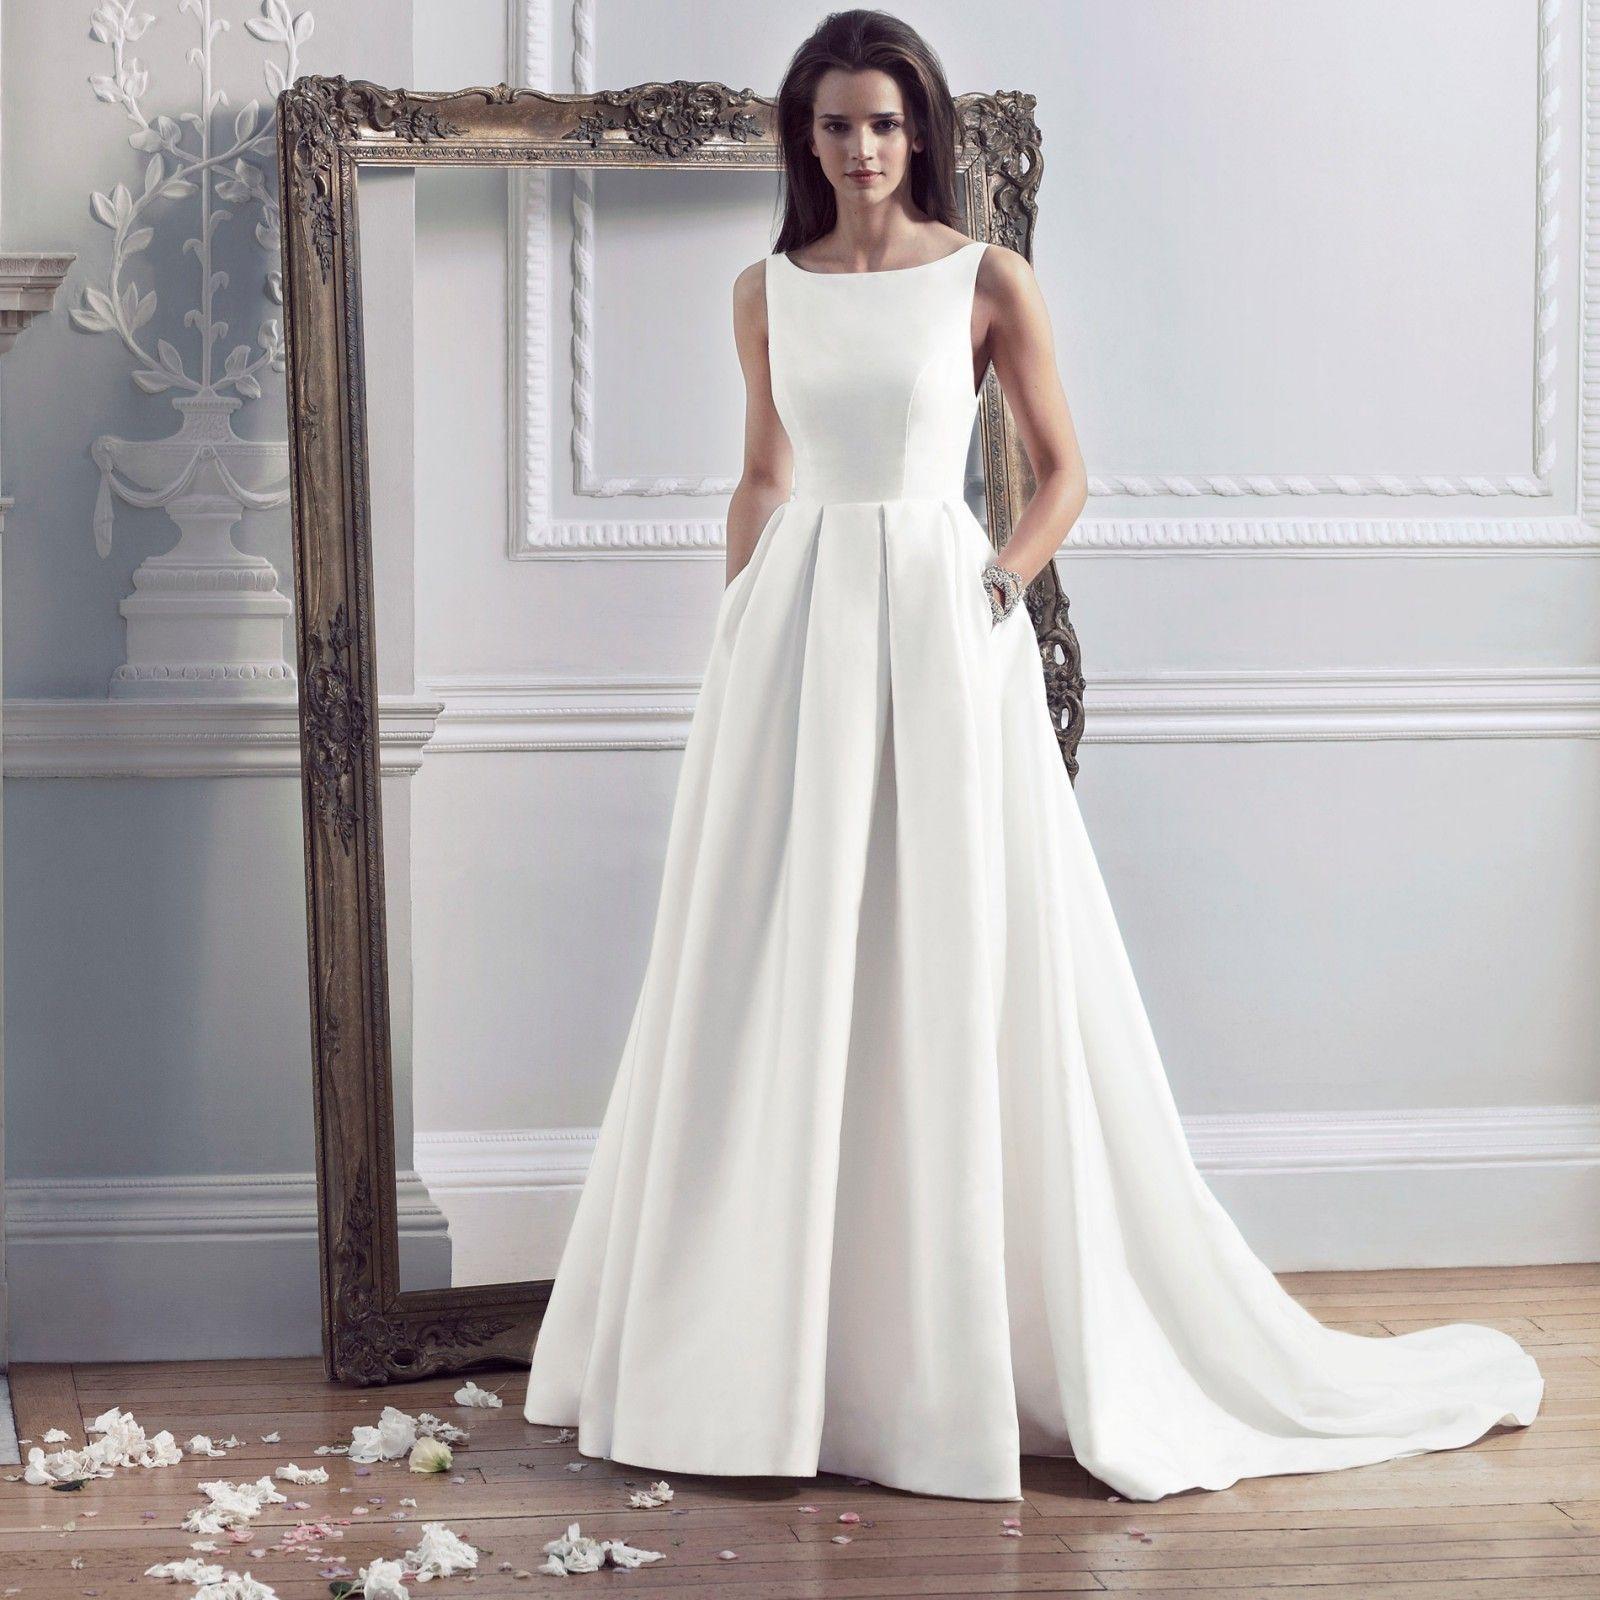 Hepburn Wedding Dress Caroline Castigliano Wedding Dress With Pockets A Line Wedding Dress Wedding Dresses